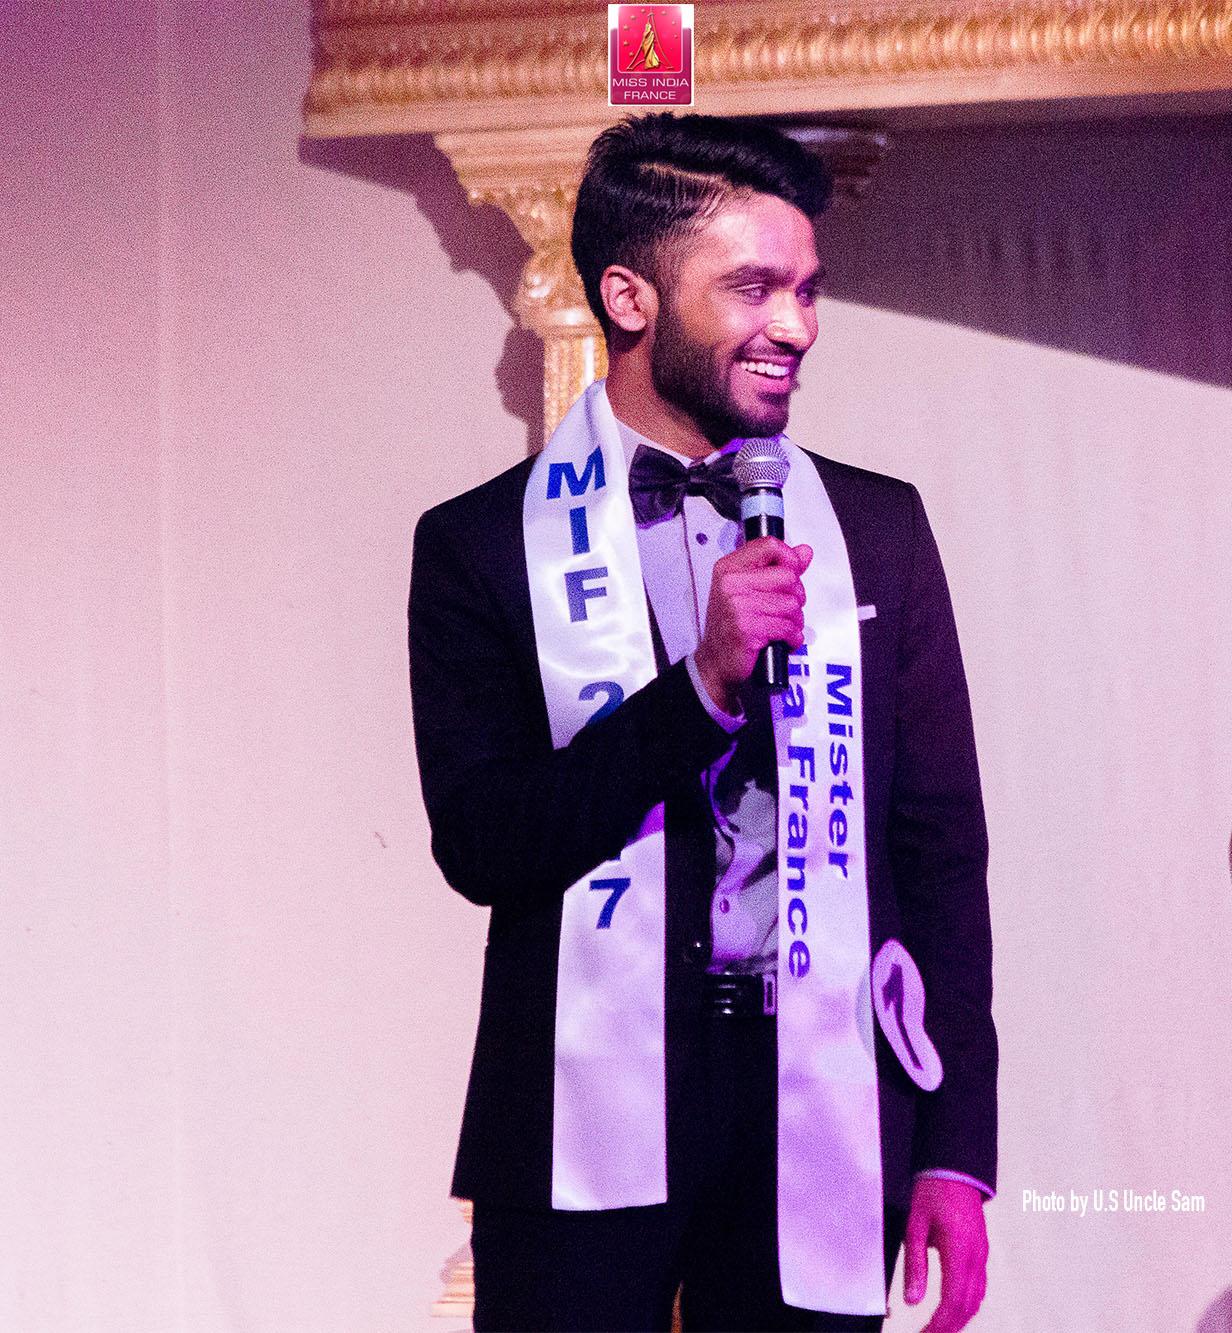 Mister India France 2017